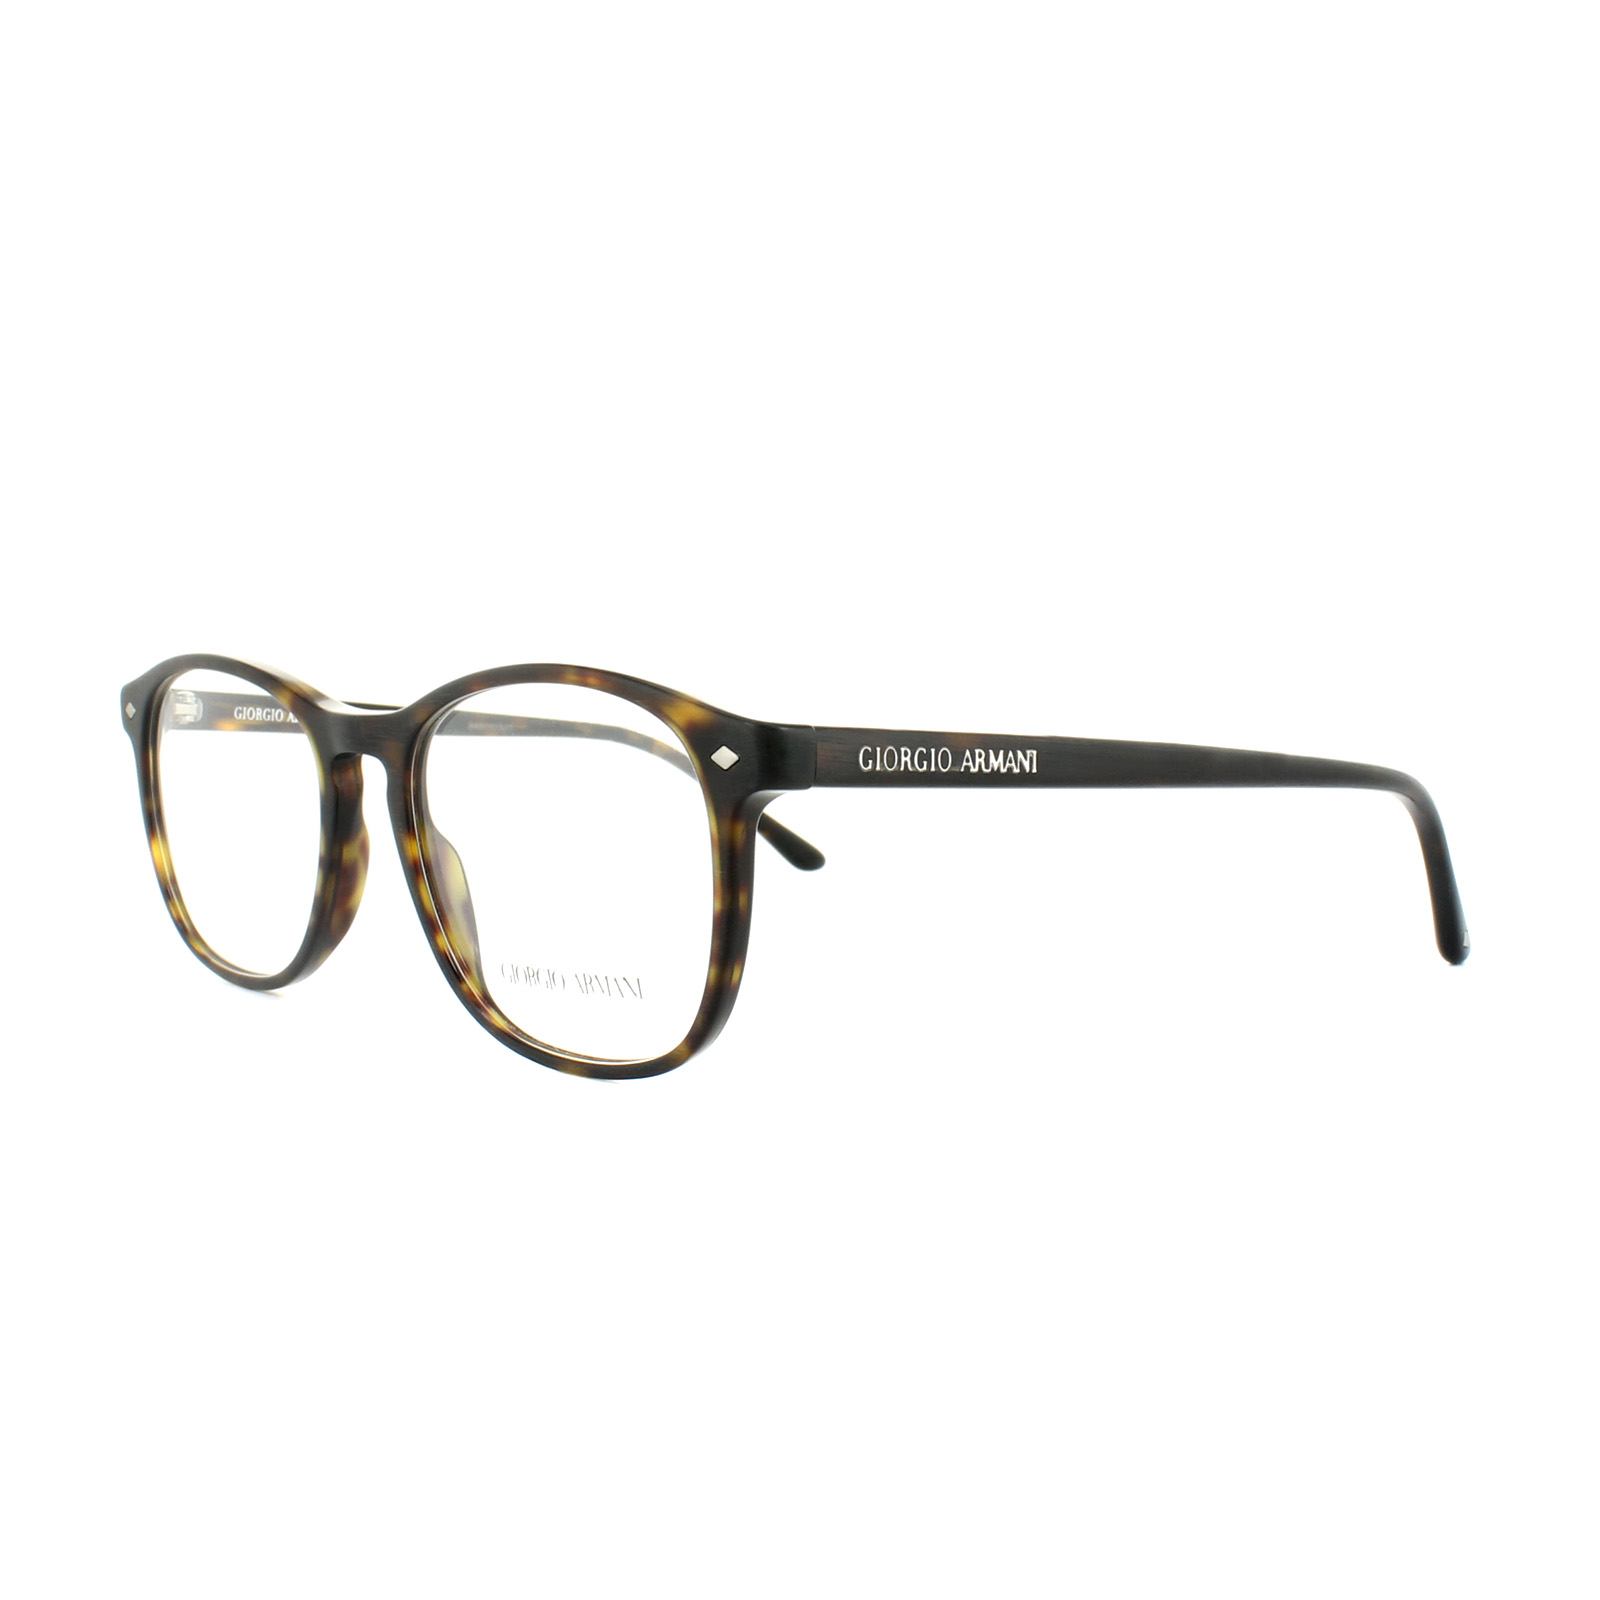 Giorgio Armani Glasses Frames AR 7003 5002 Matte Dark Havana Mens ...